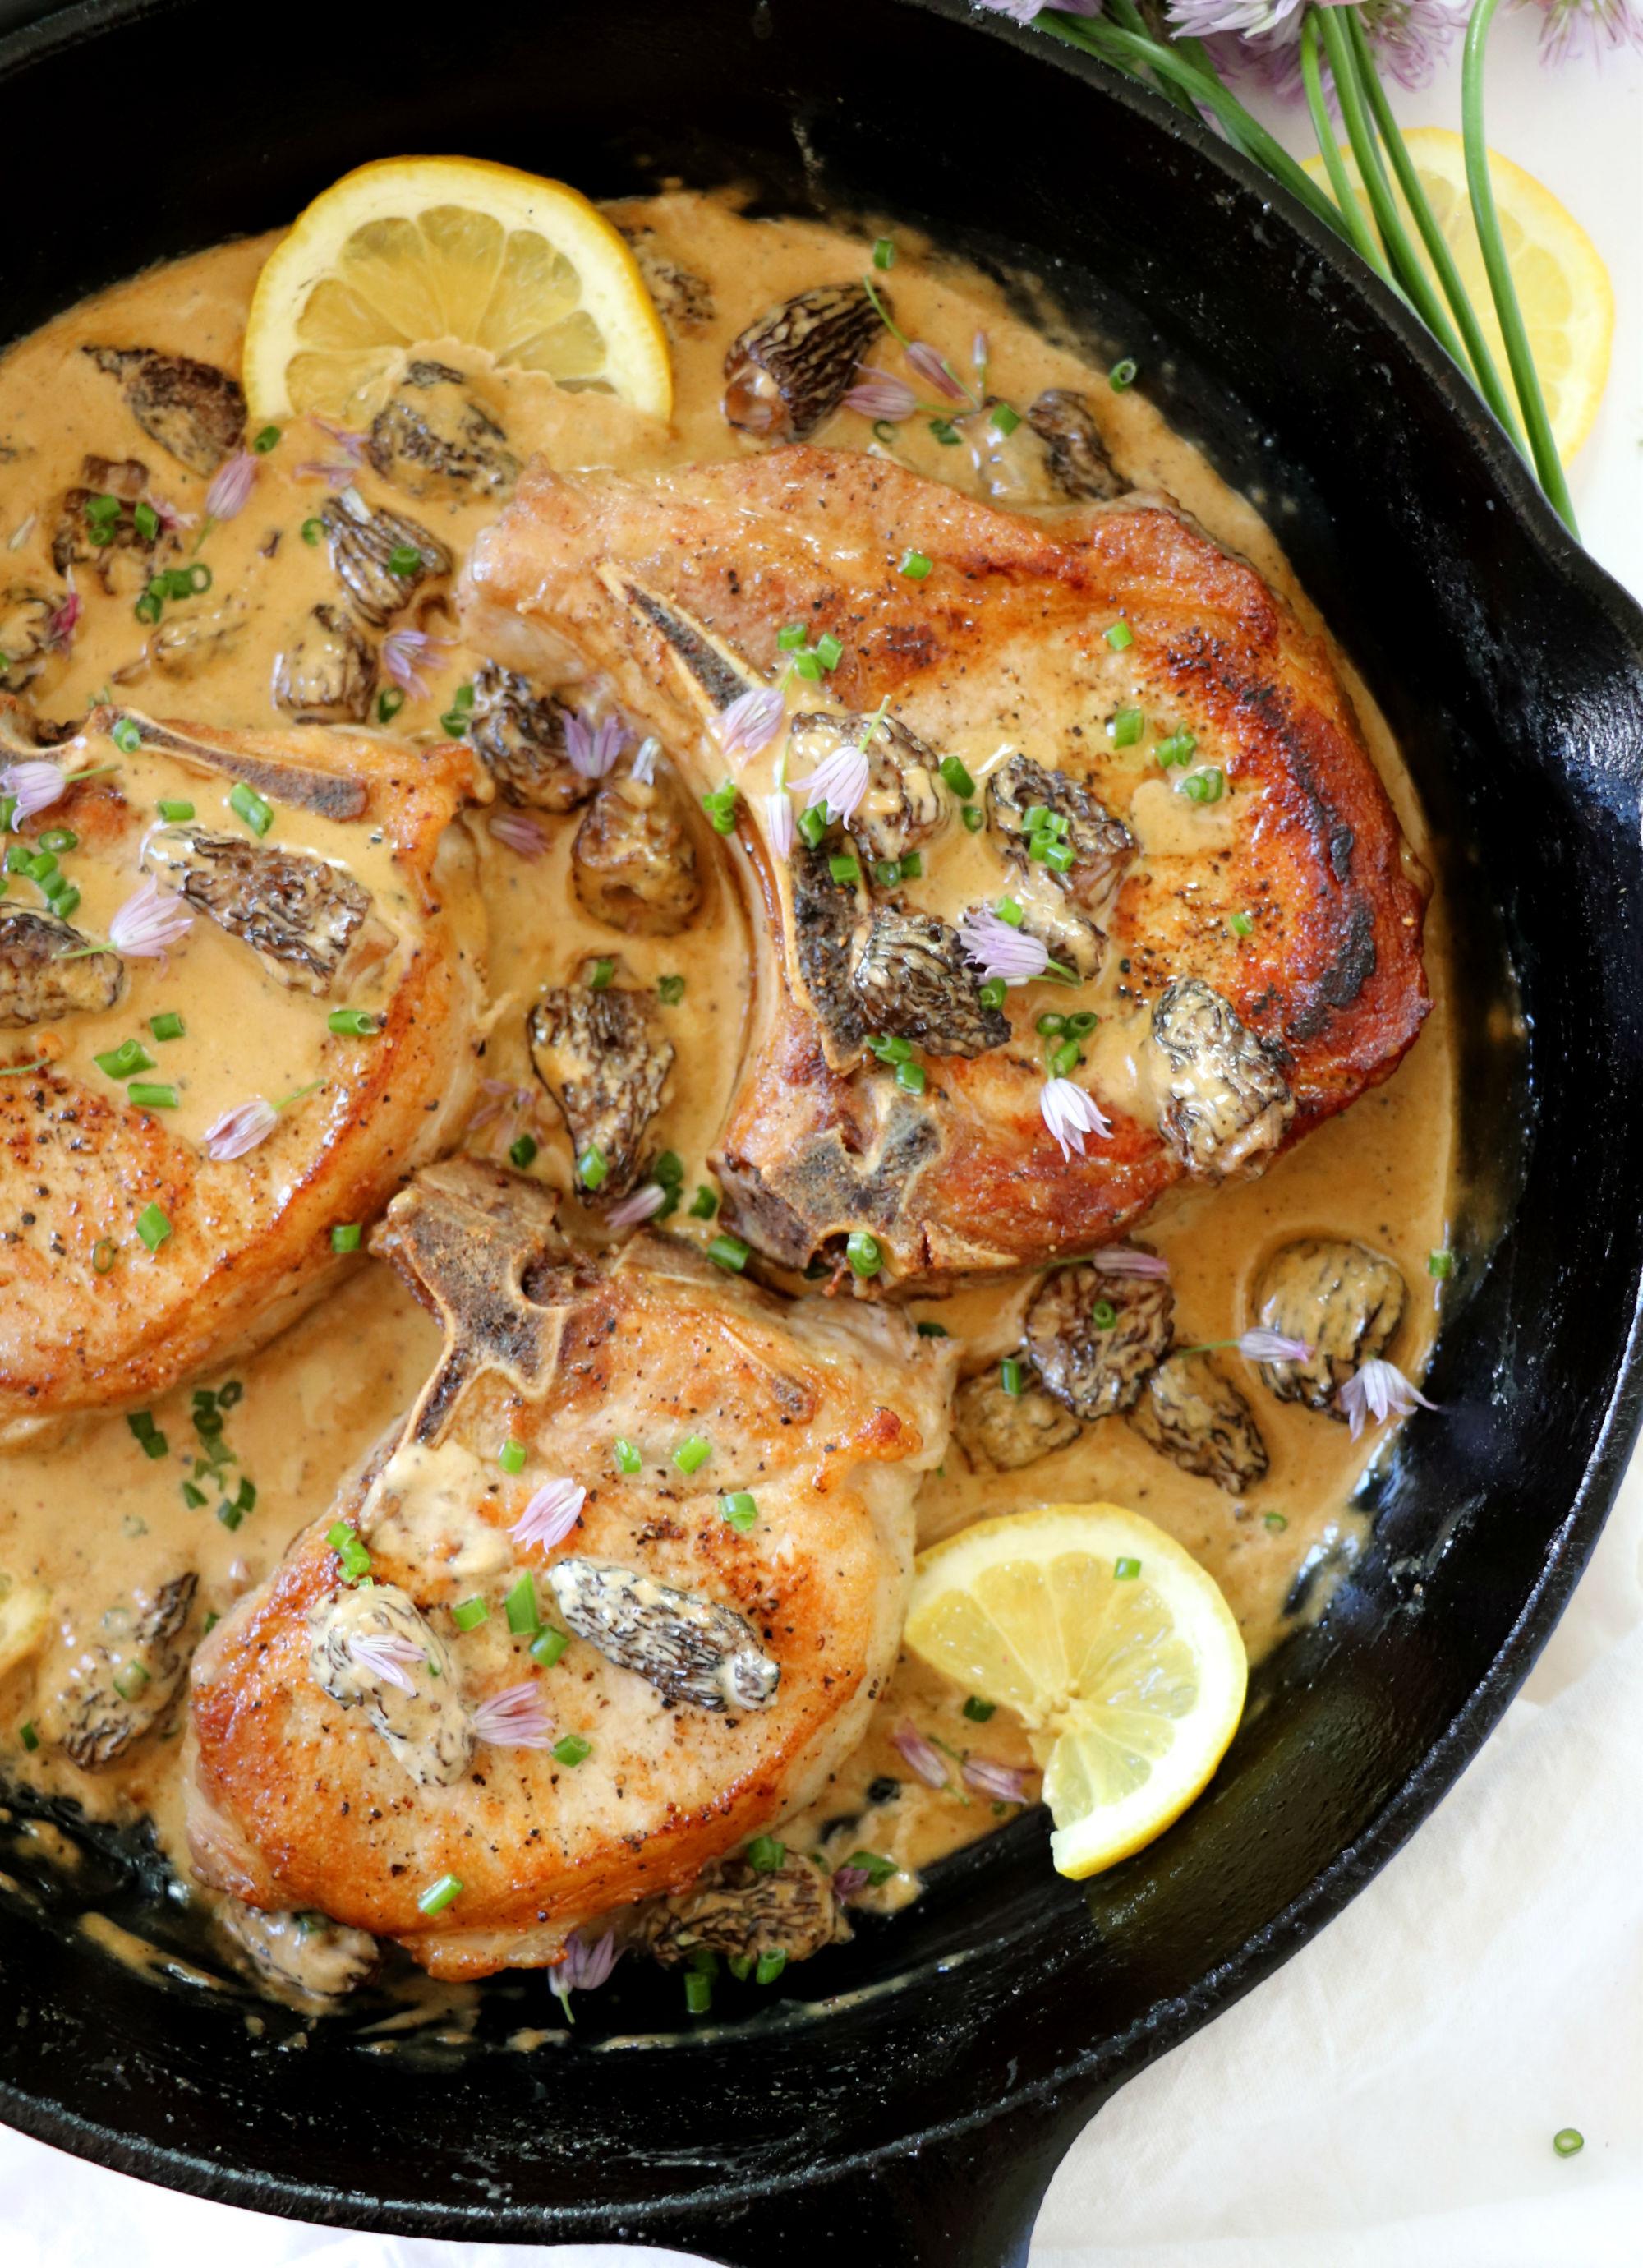 Pork Chops with Morel Mushroom Brandy Cream Sauce